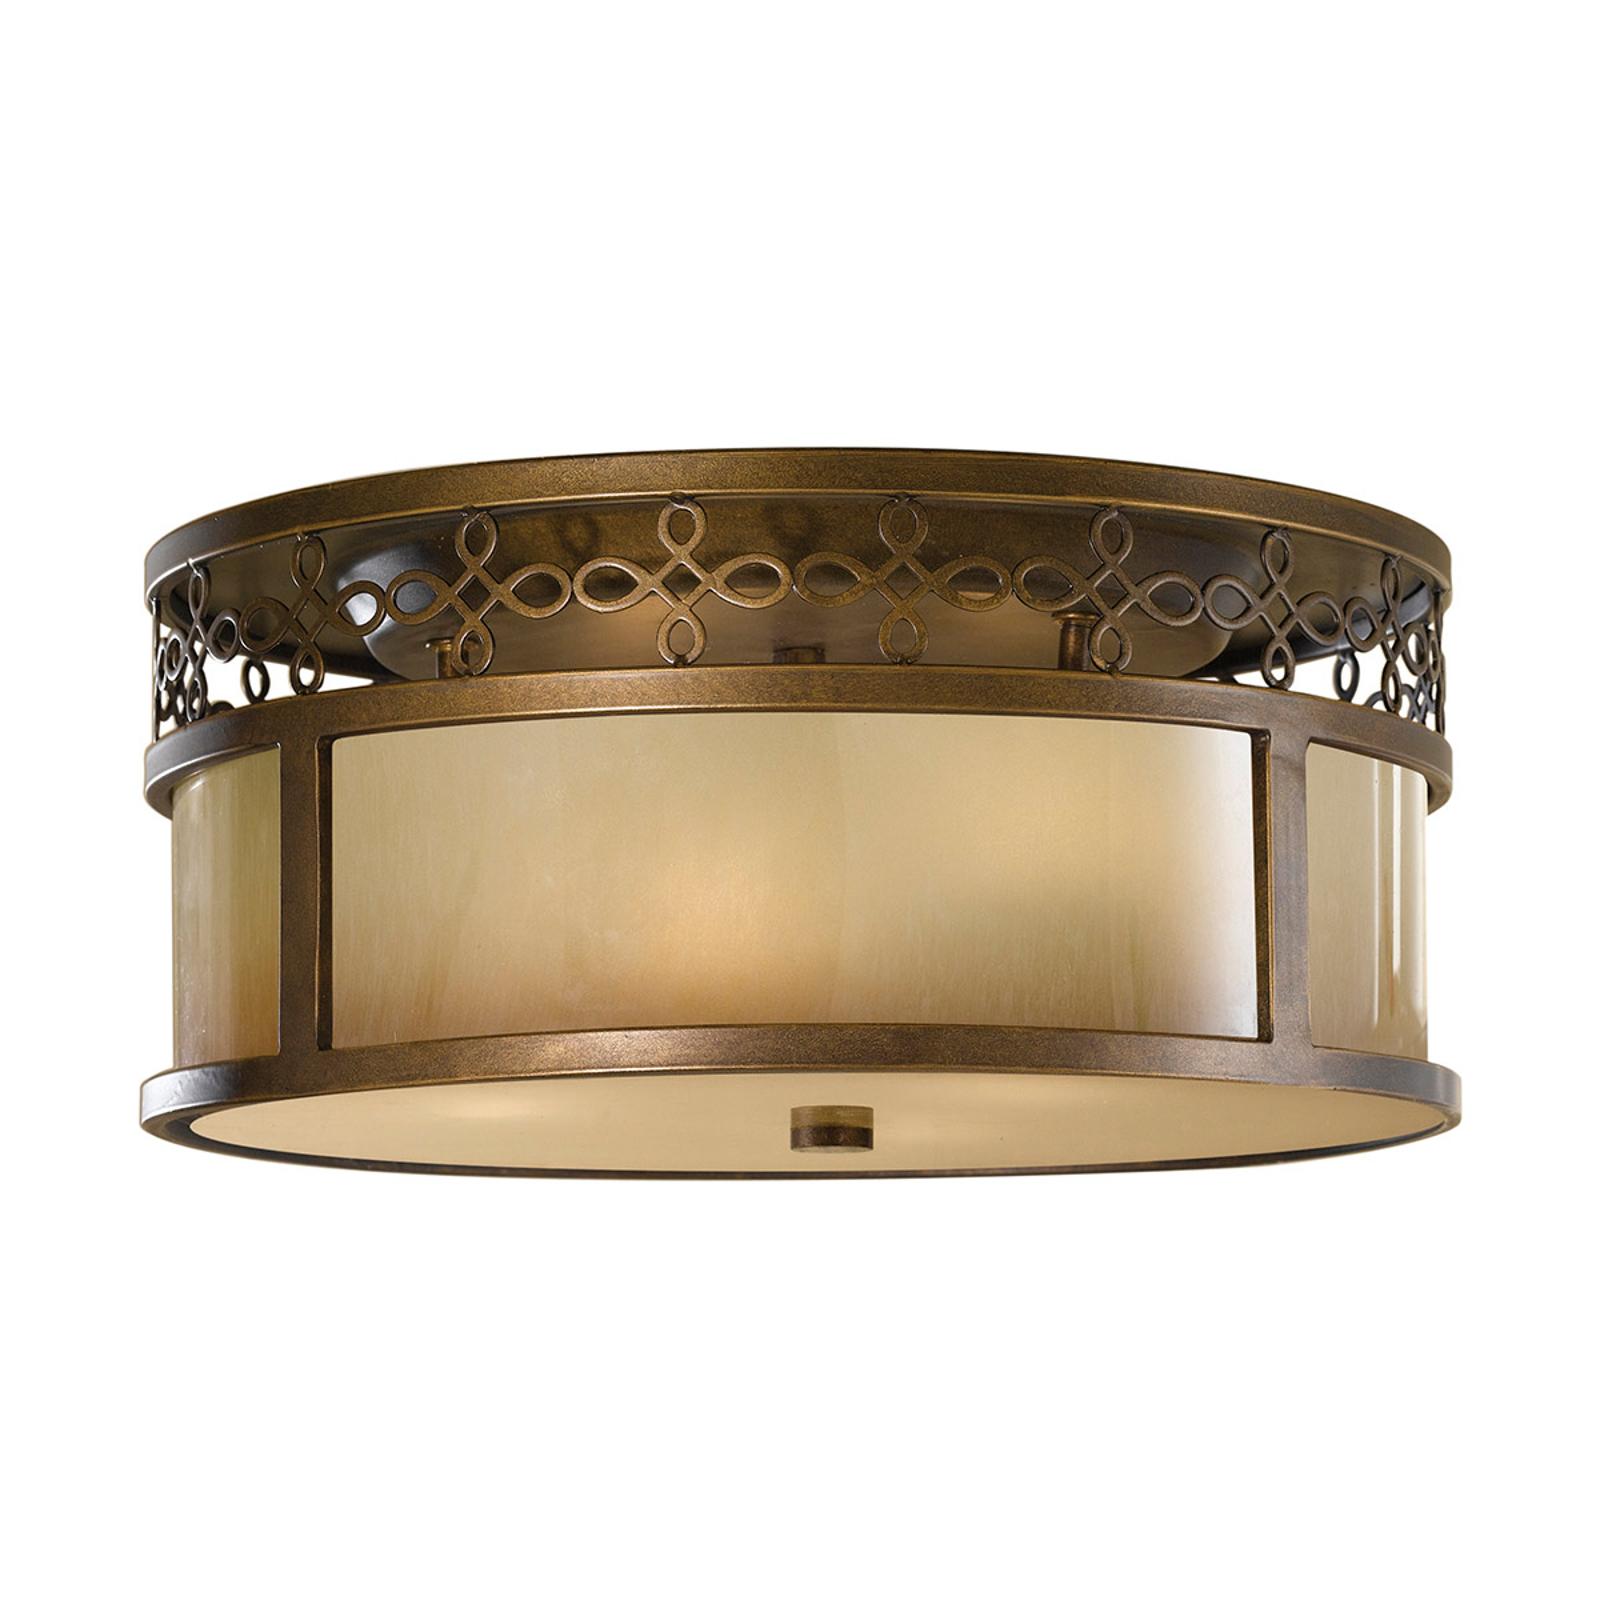 Justine Ceiling Light Antique Look_3048235_1